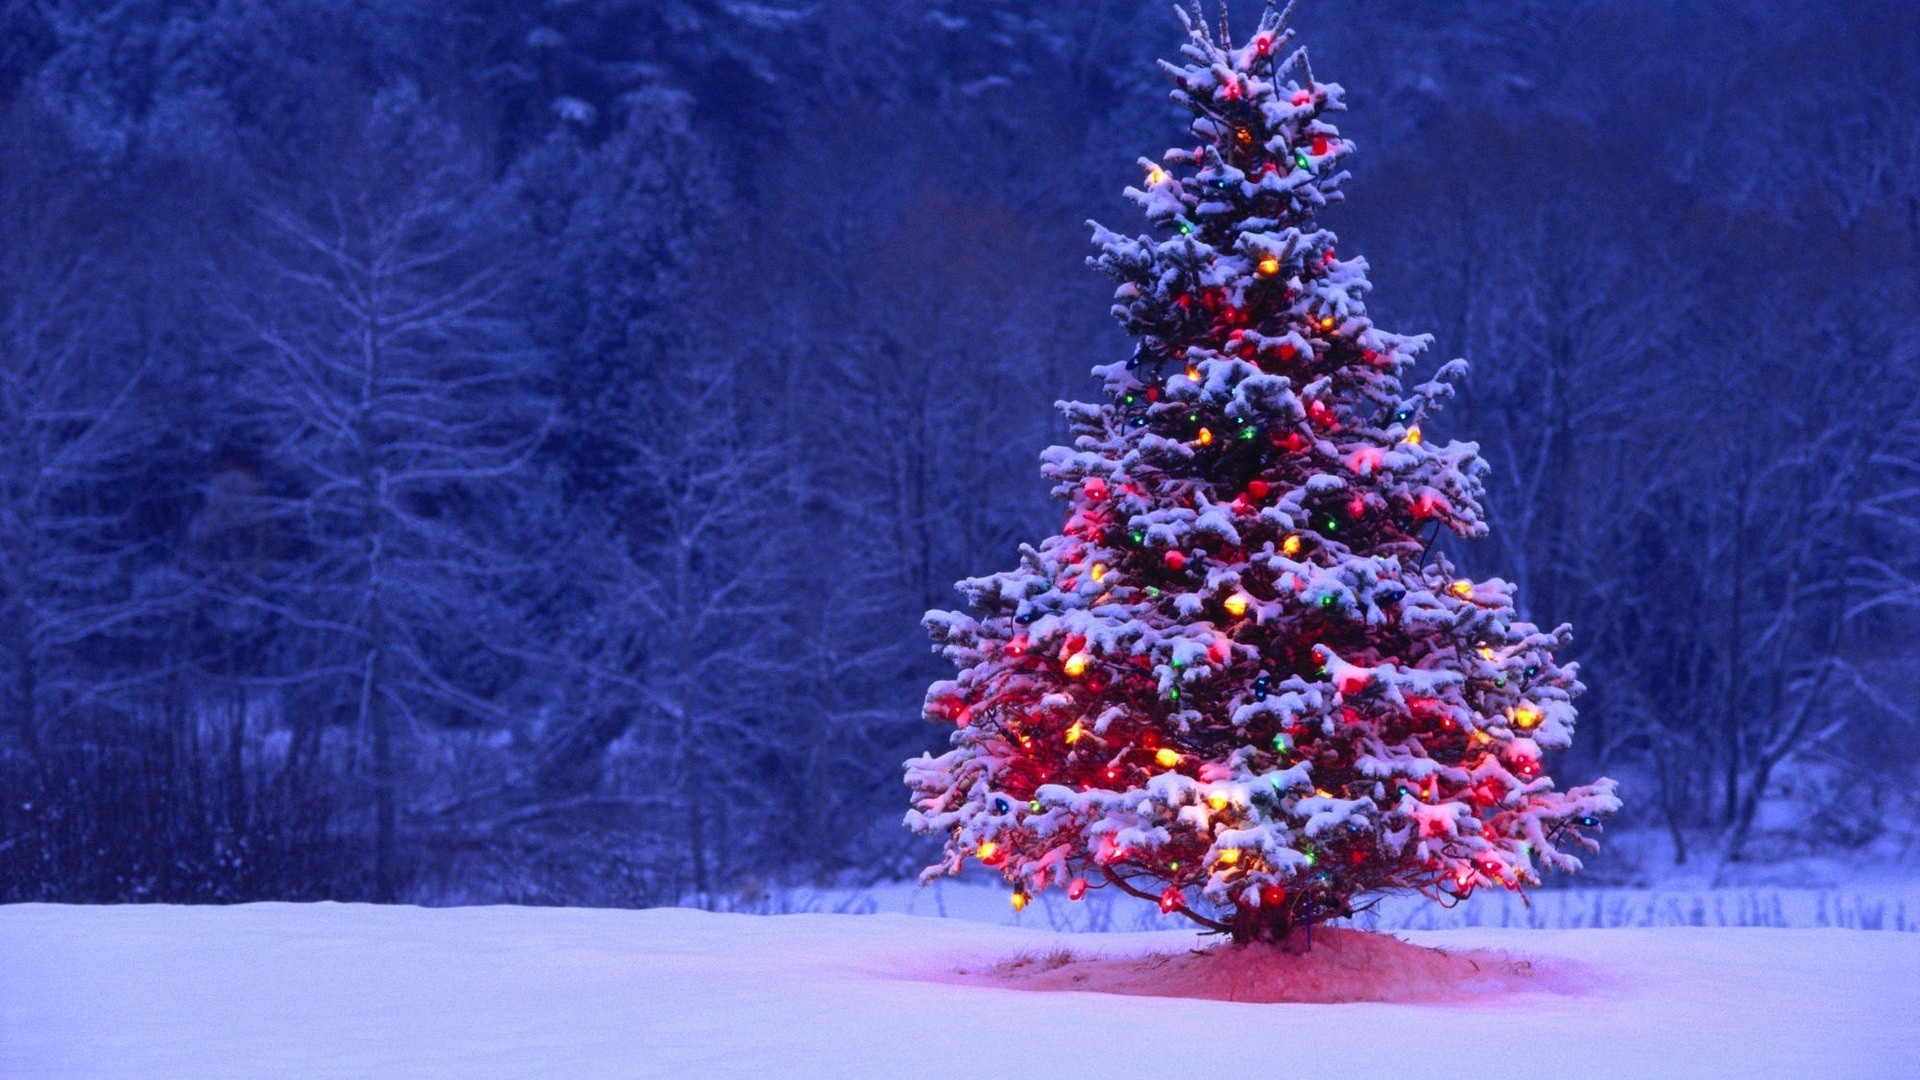 Hd Christmas Desktop Backgrounds 69 Pictures